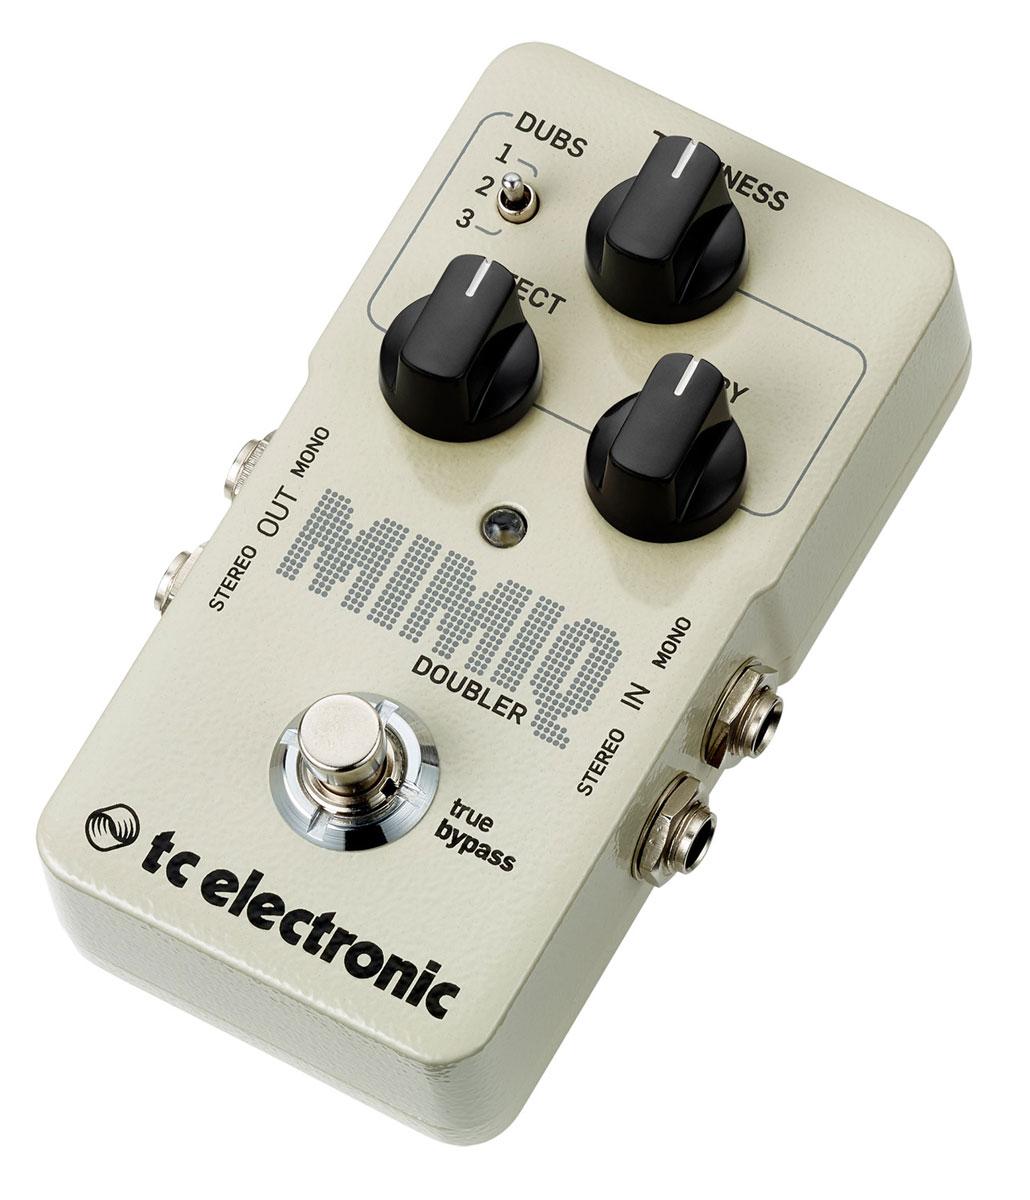 tc electronic / Mimiq Doubler【ダブリングエフェクター】【新宿店】